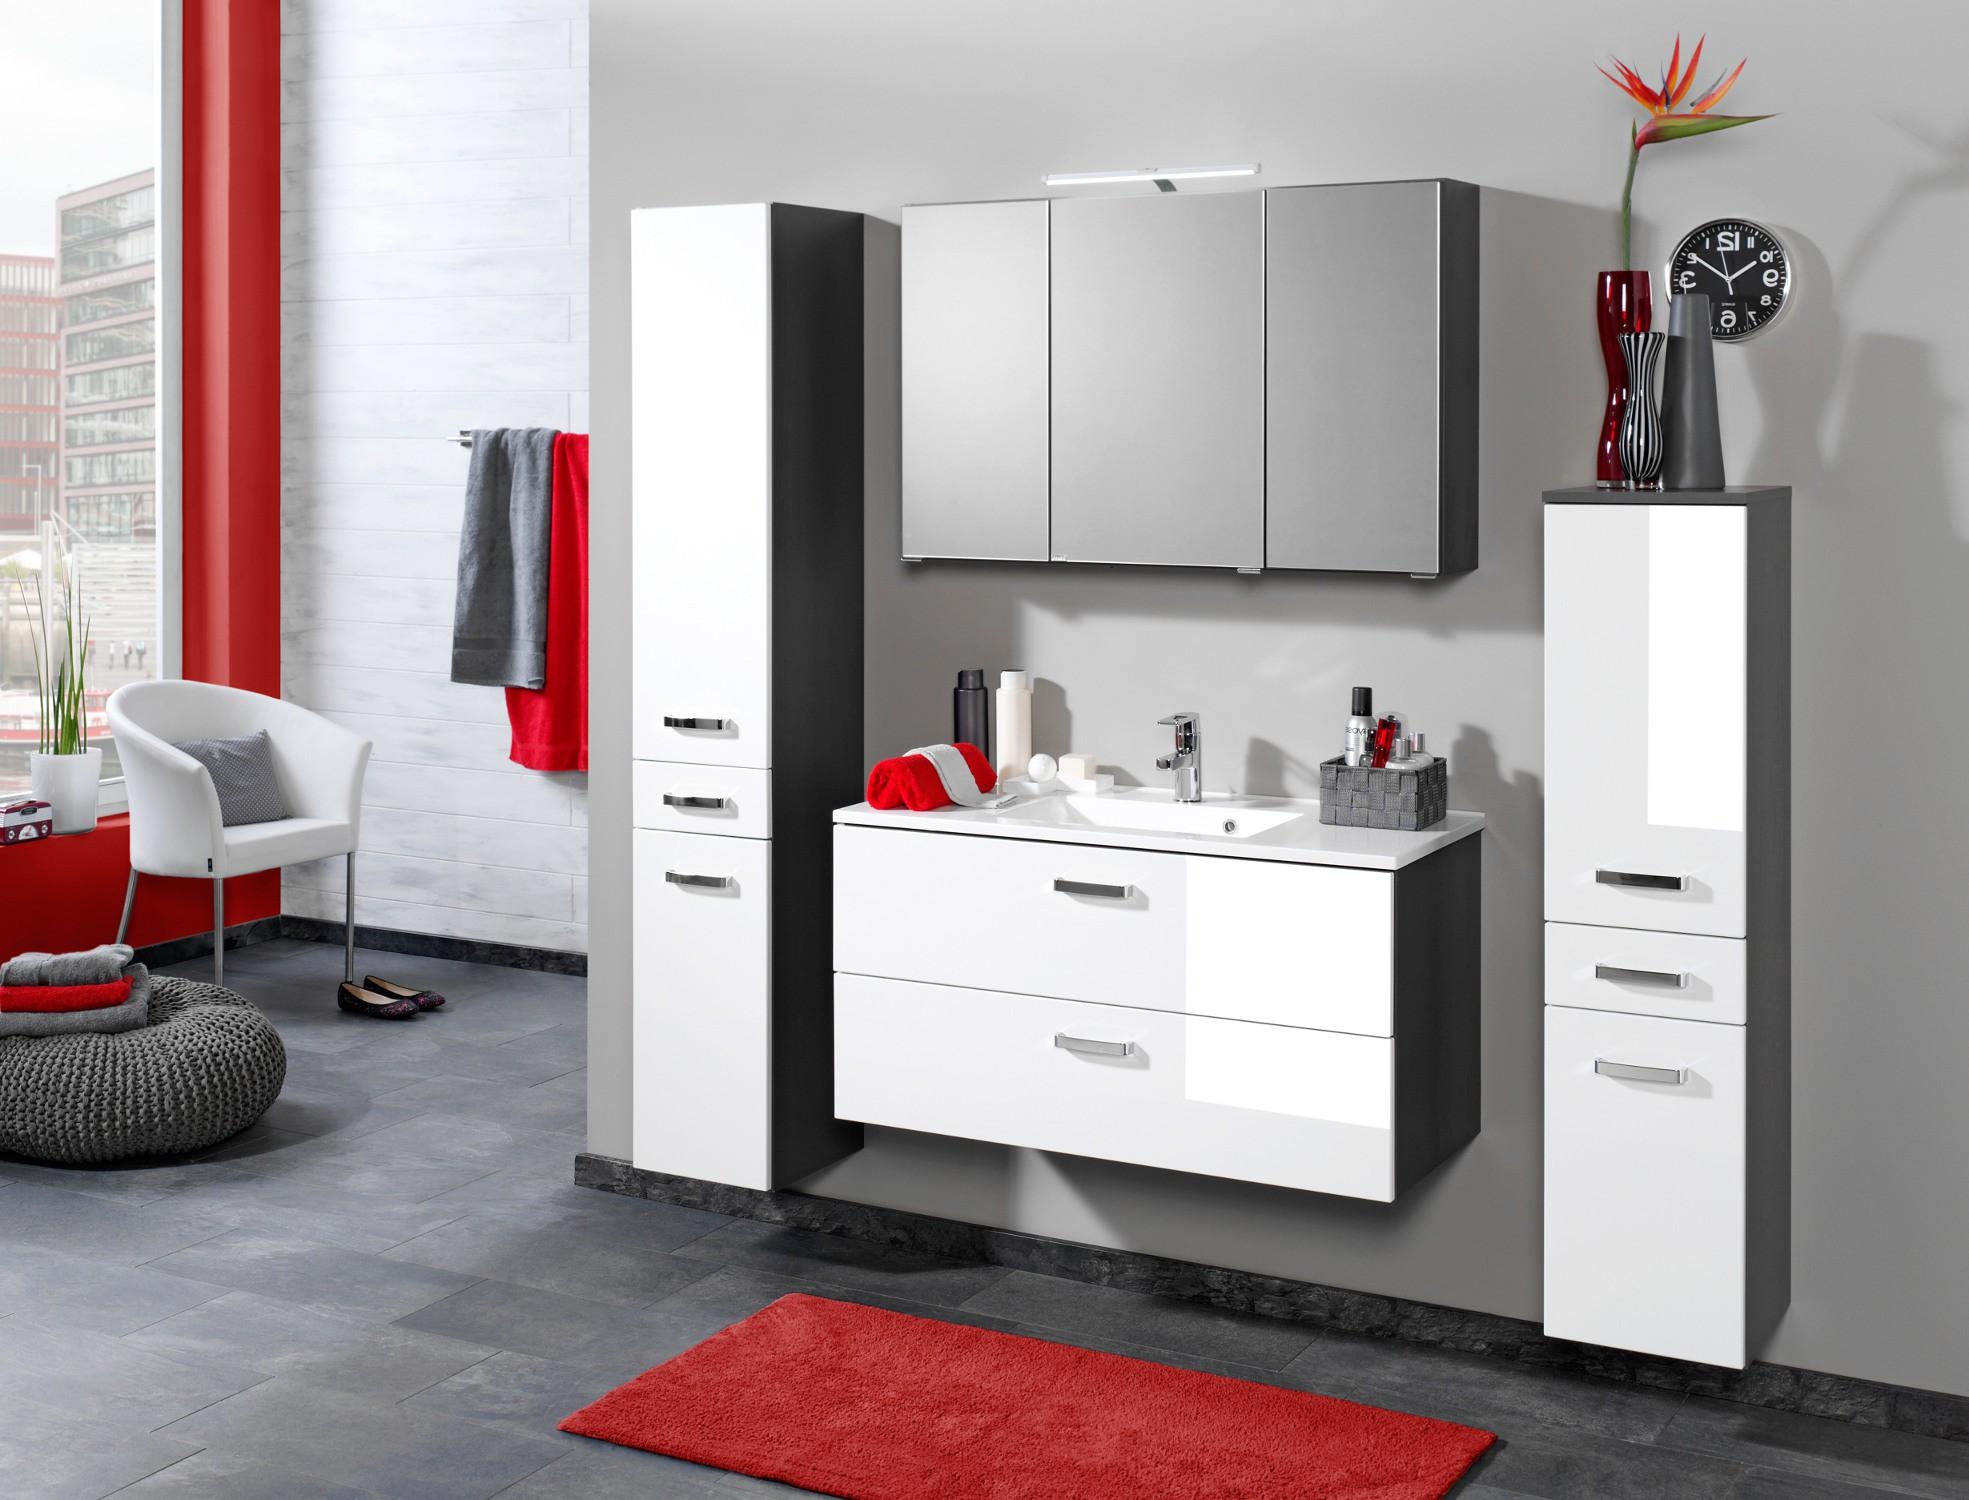 neu badezimmerspiegel spiegelschrank 3d badspiegel led. Black Bedroom Furniture Sets. Home Design Ideas